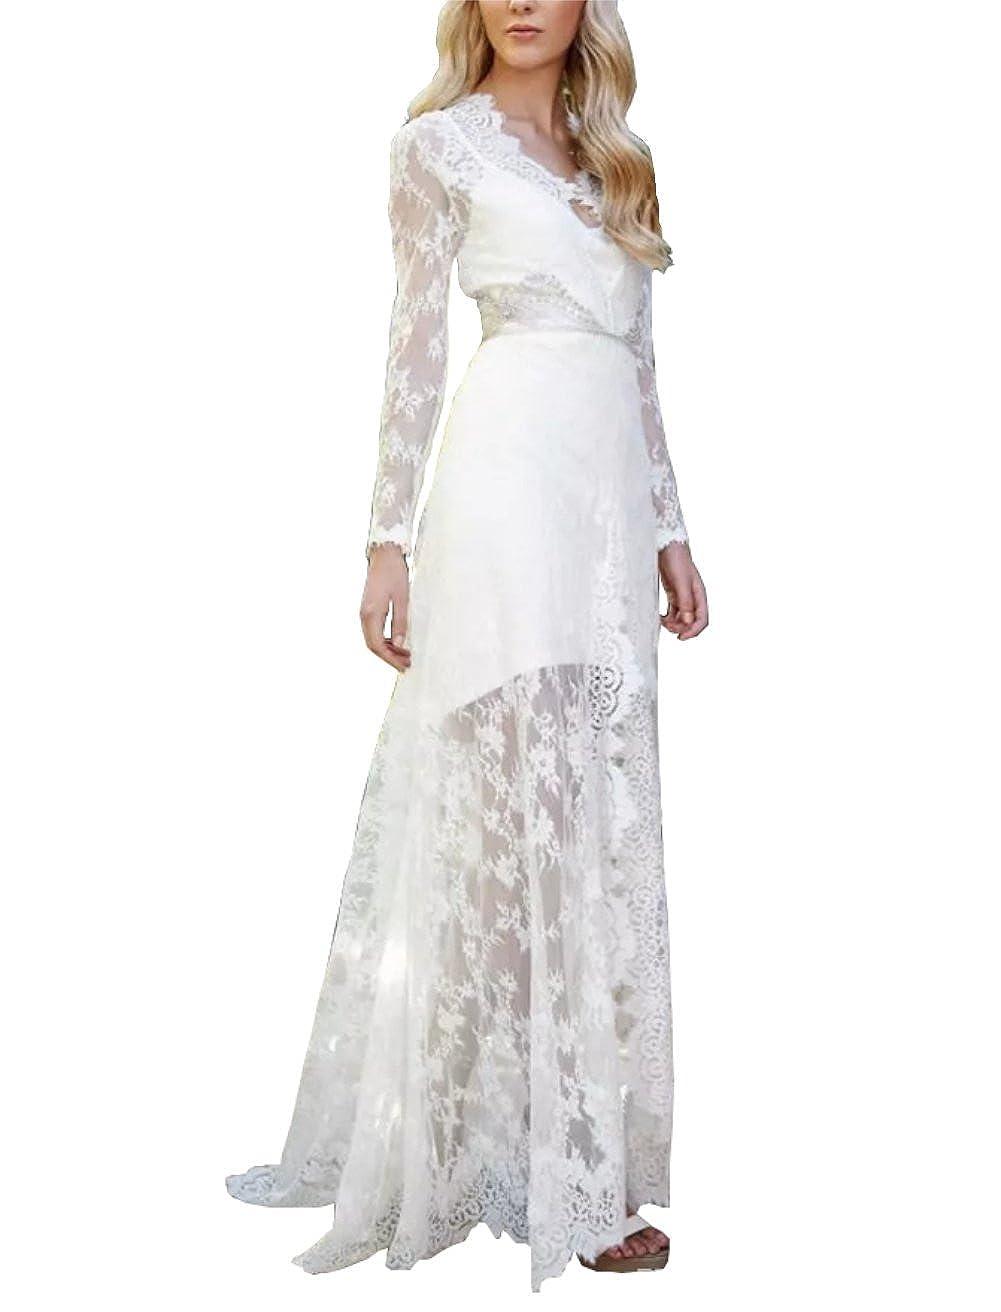 Kiss Rain Womens Deep V Neck Lace Wedding Dress with Long Sleeves